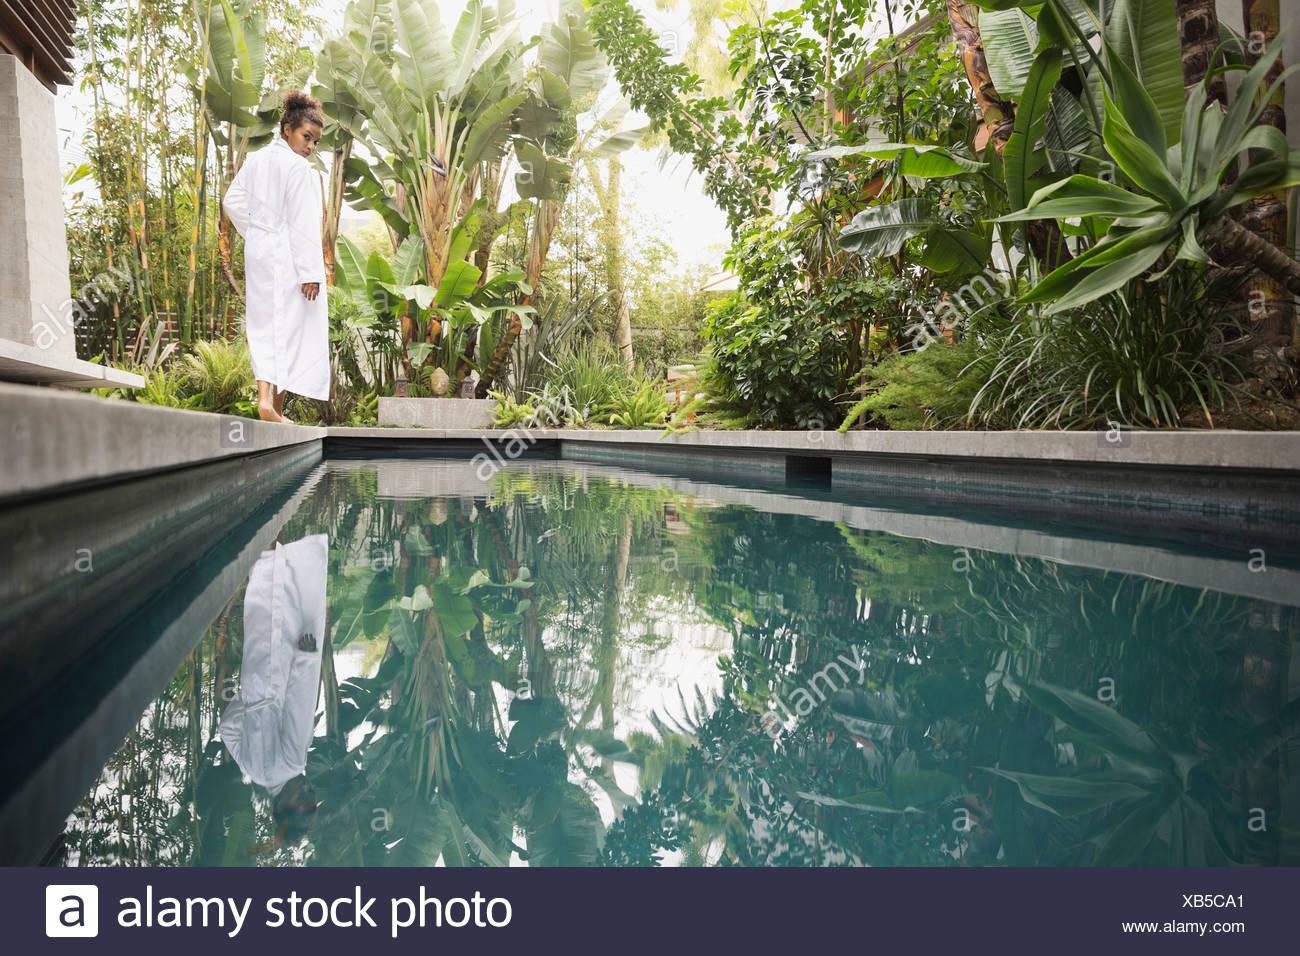 Woman walking at the edge of swimming pool Stock Photo